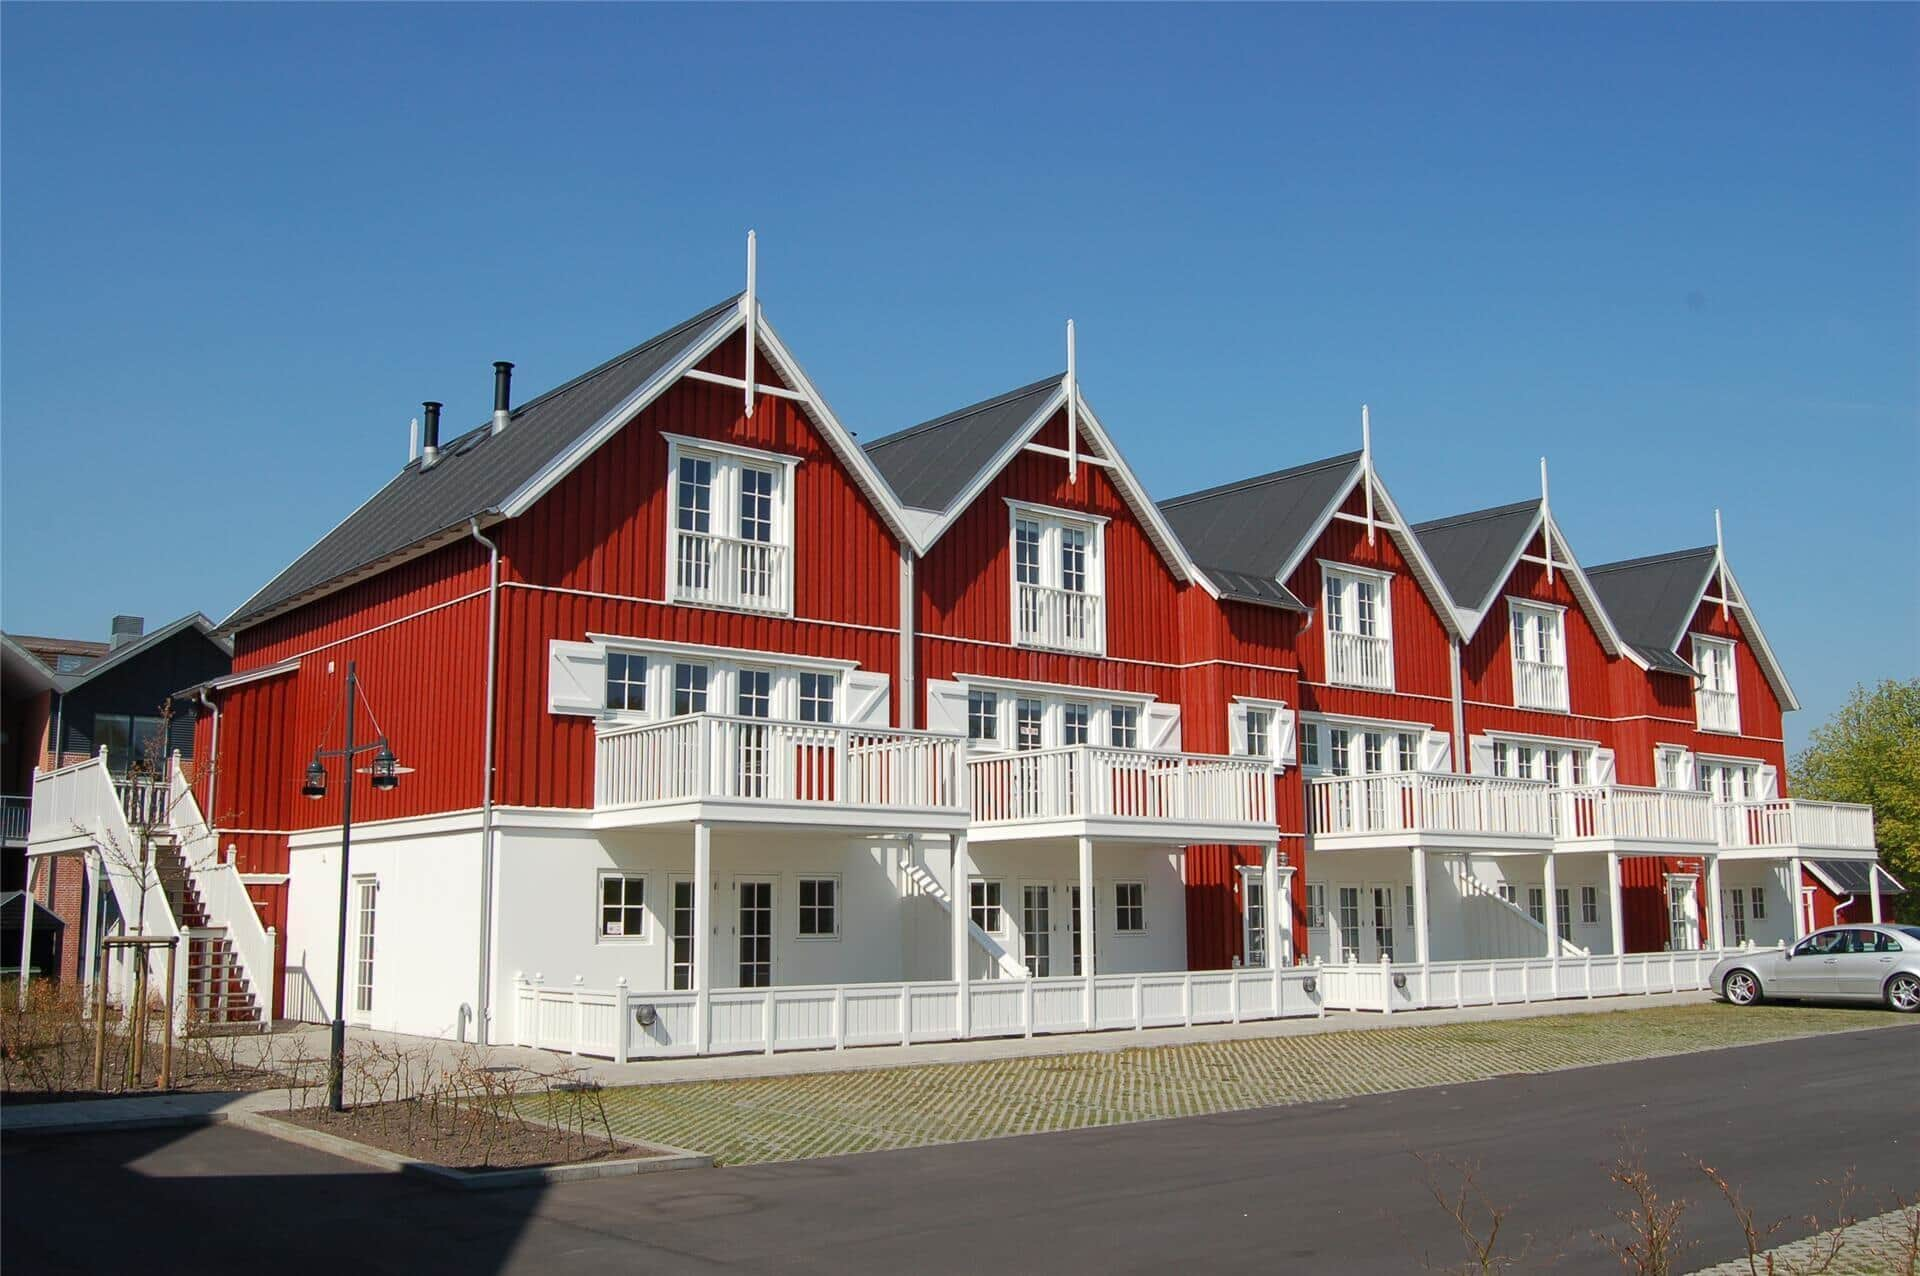 Billede 1-3 Sommerhus F50402, Østersøvej 1, DK - 6300 Gråsten